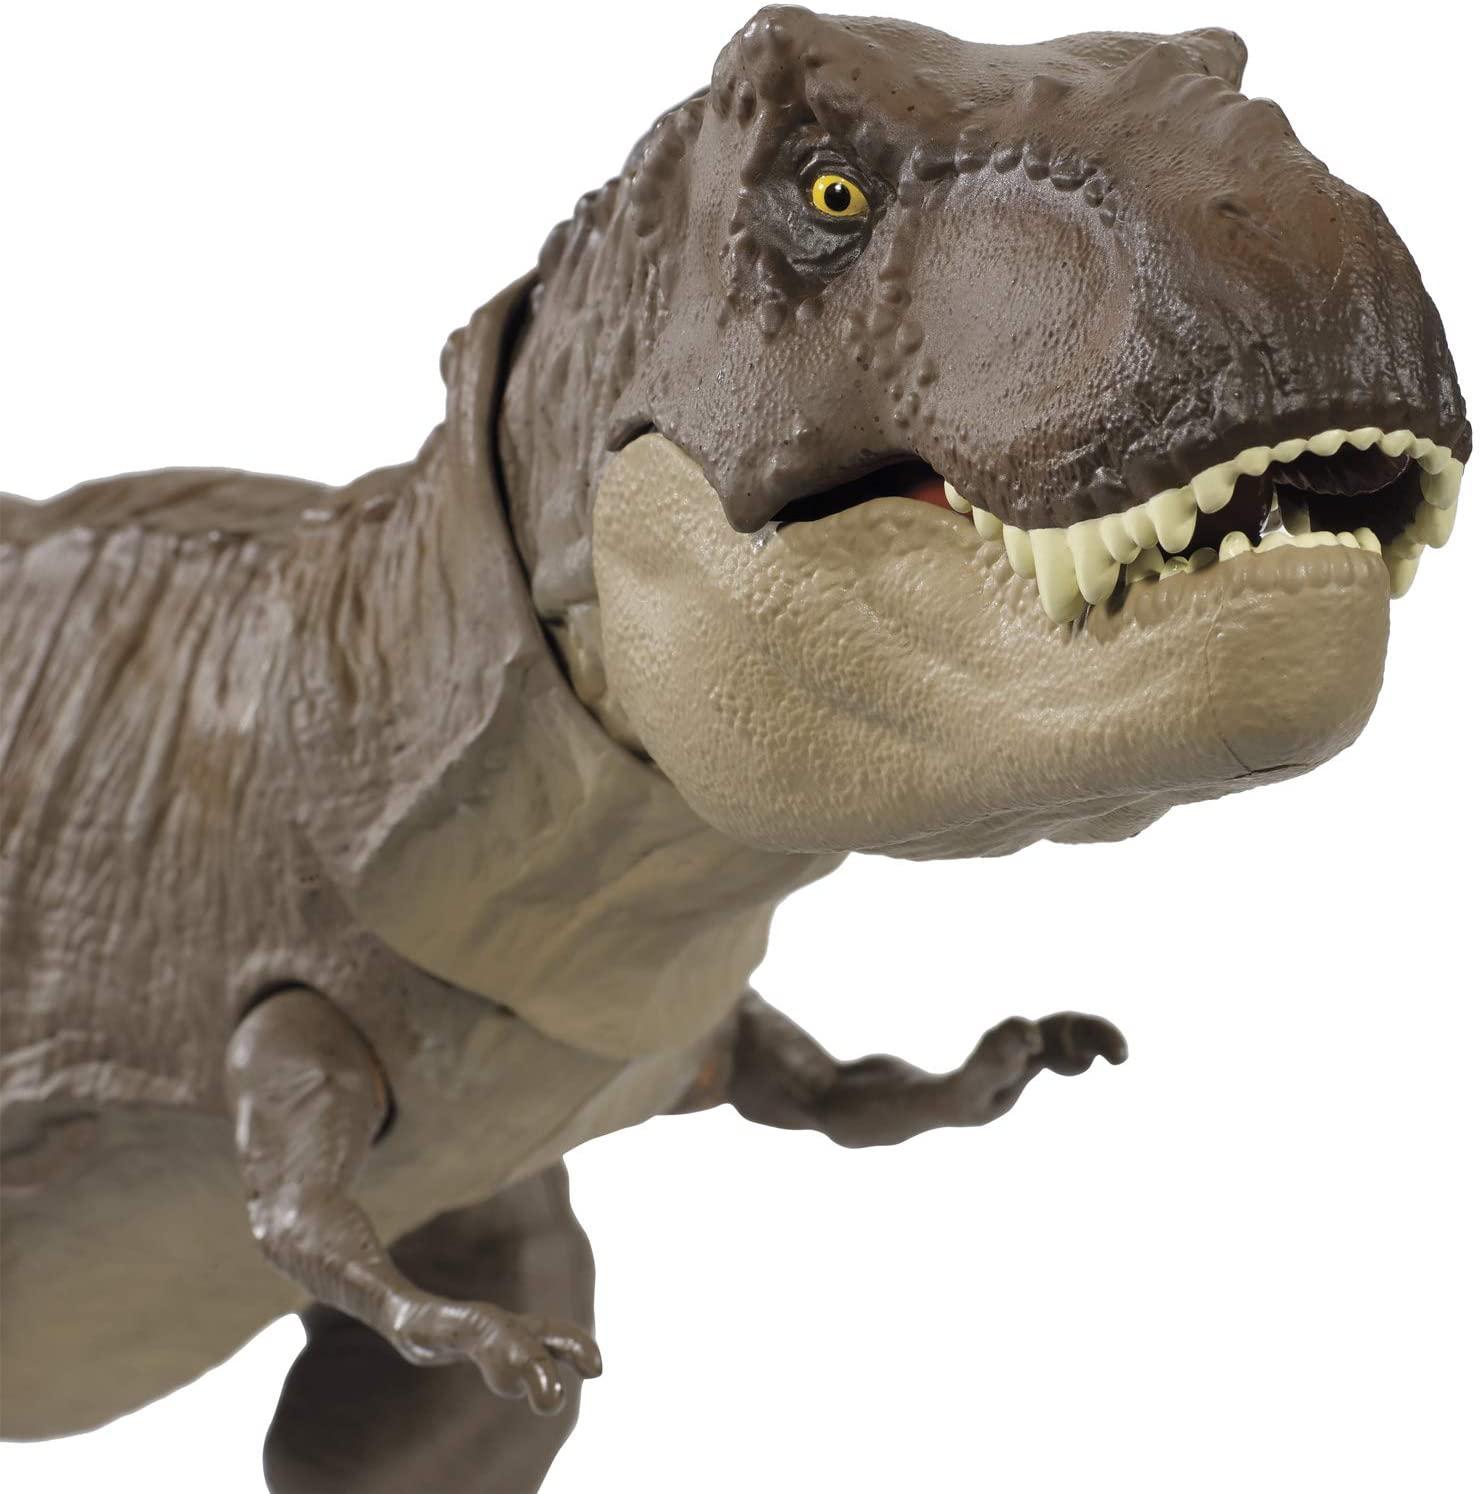 Dinossauro Tiranossauro Rex Mordida - Jurassic World Mattel